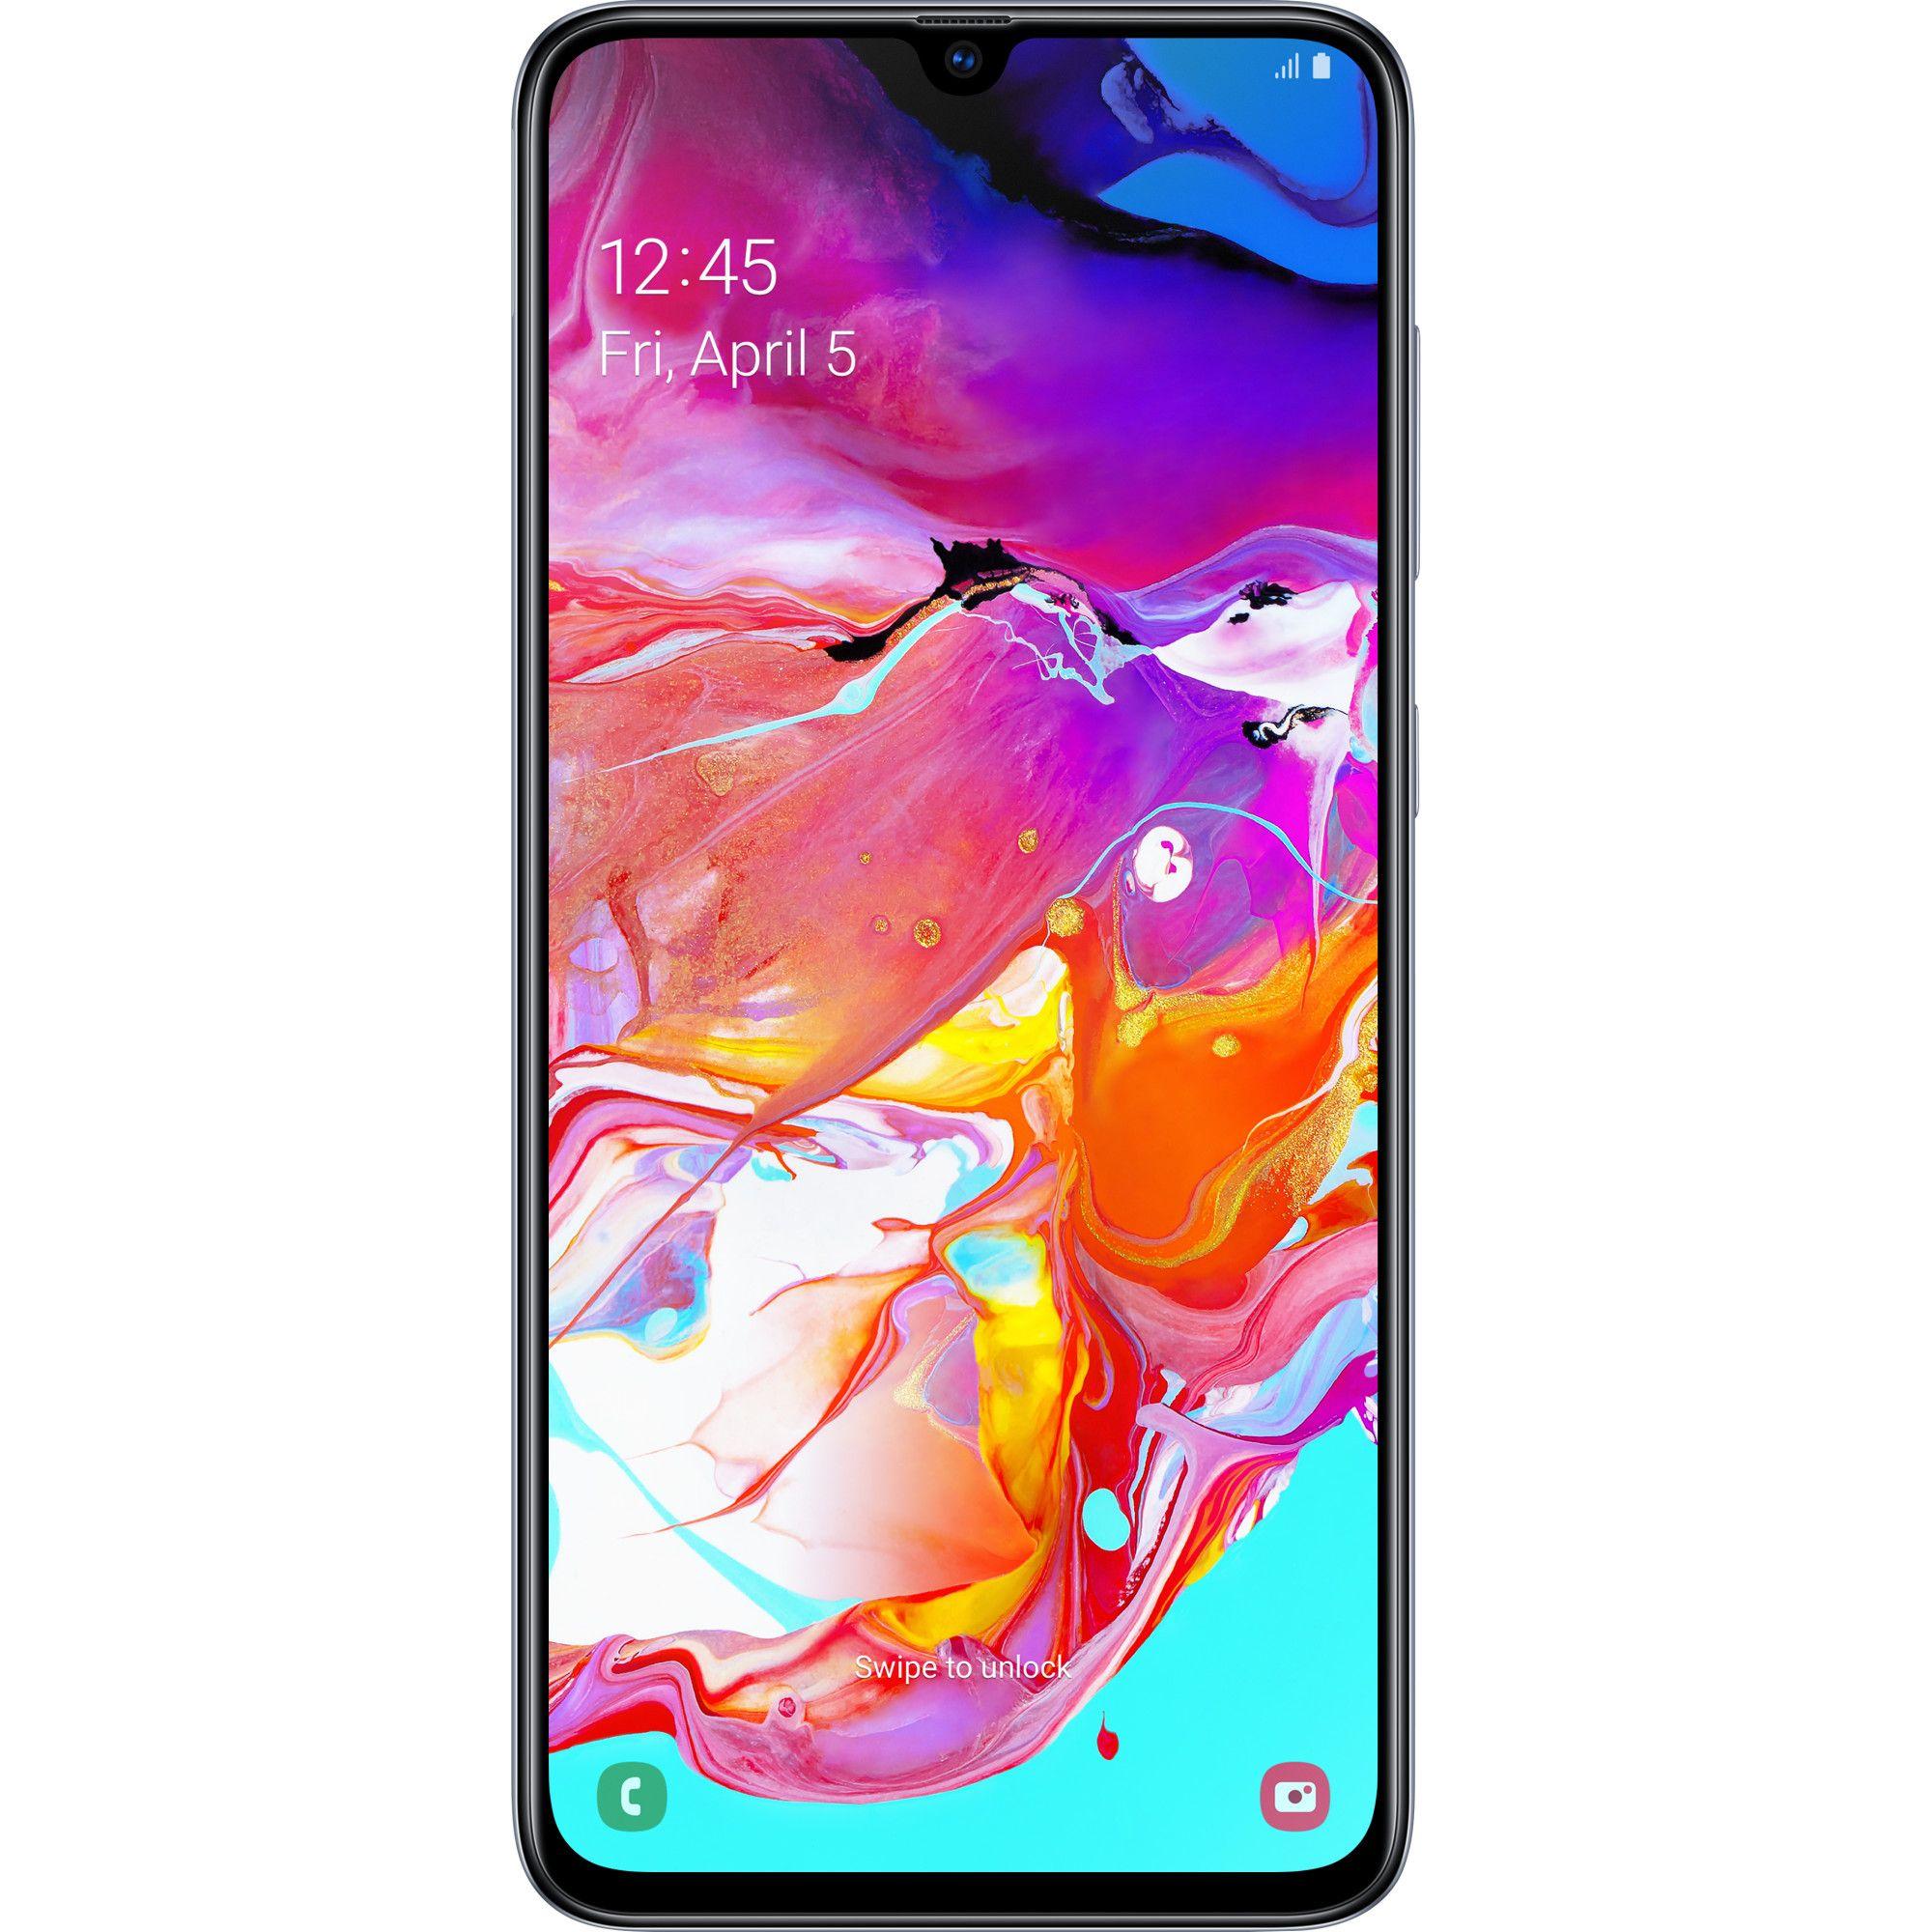 Telefon Mobil Samsung Galaxy A70 128GB Flash 6GB RAM Dual SIM 4G White